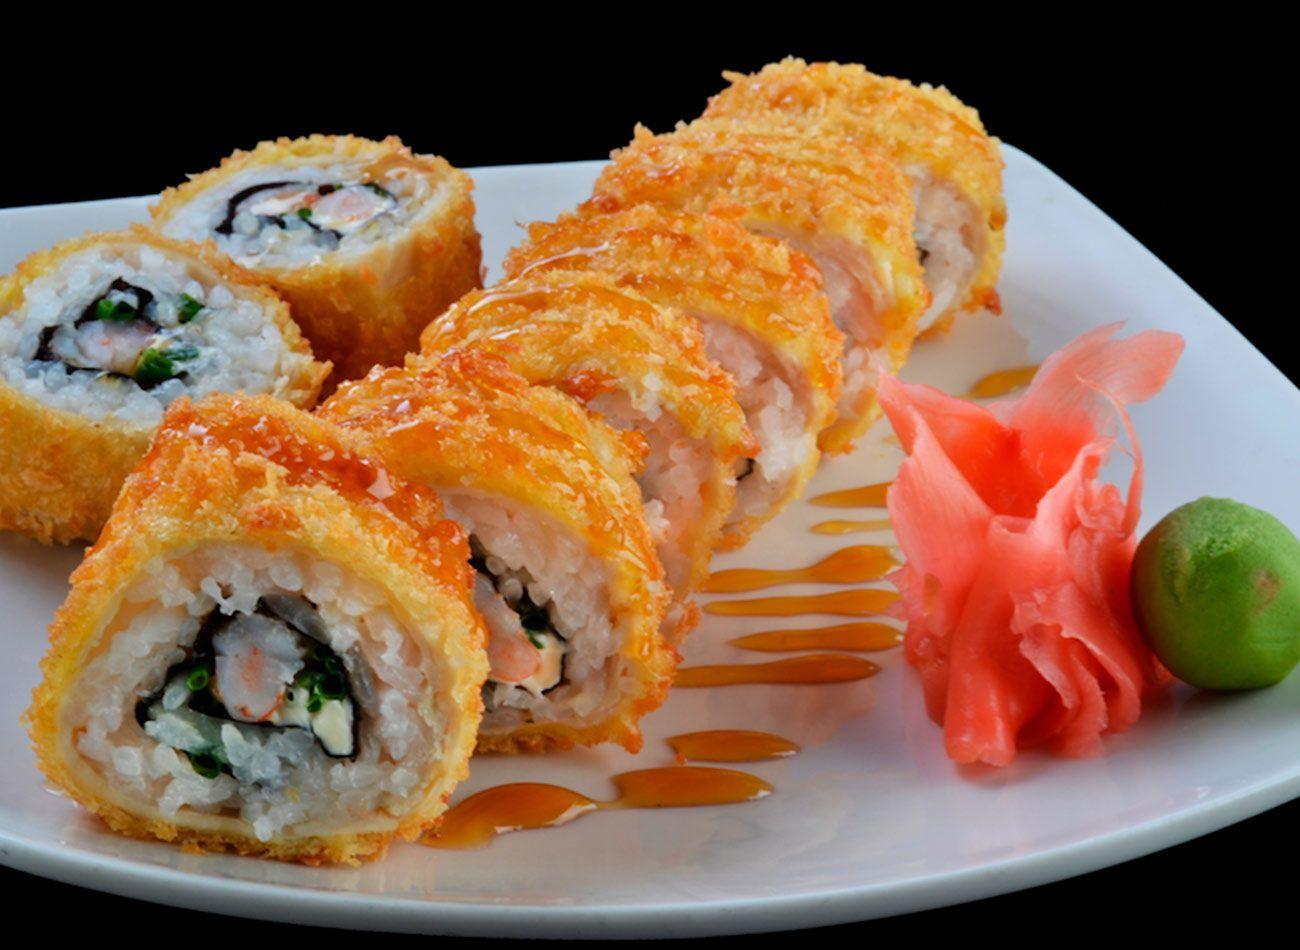 Fukai Restaurante - Reserva y Pide Delivery o Take Out en restaurantes de Comida Nikkei - Restaurantes en Providencia - MESA 24/7 | Santiago - Chile